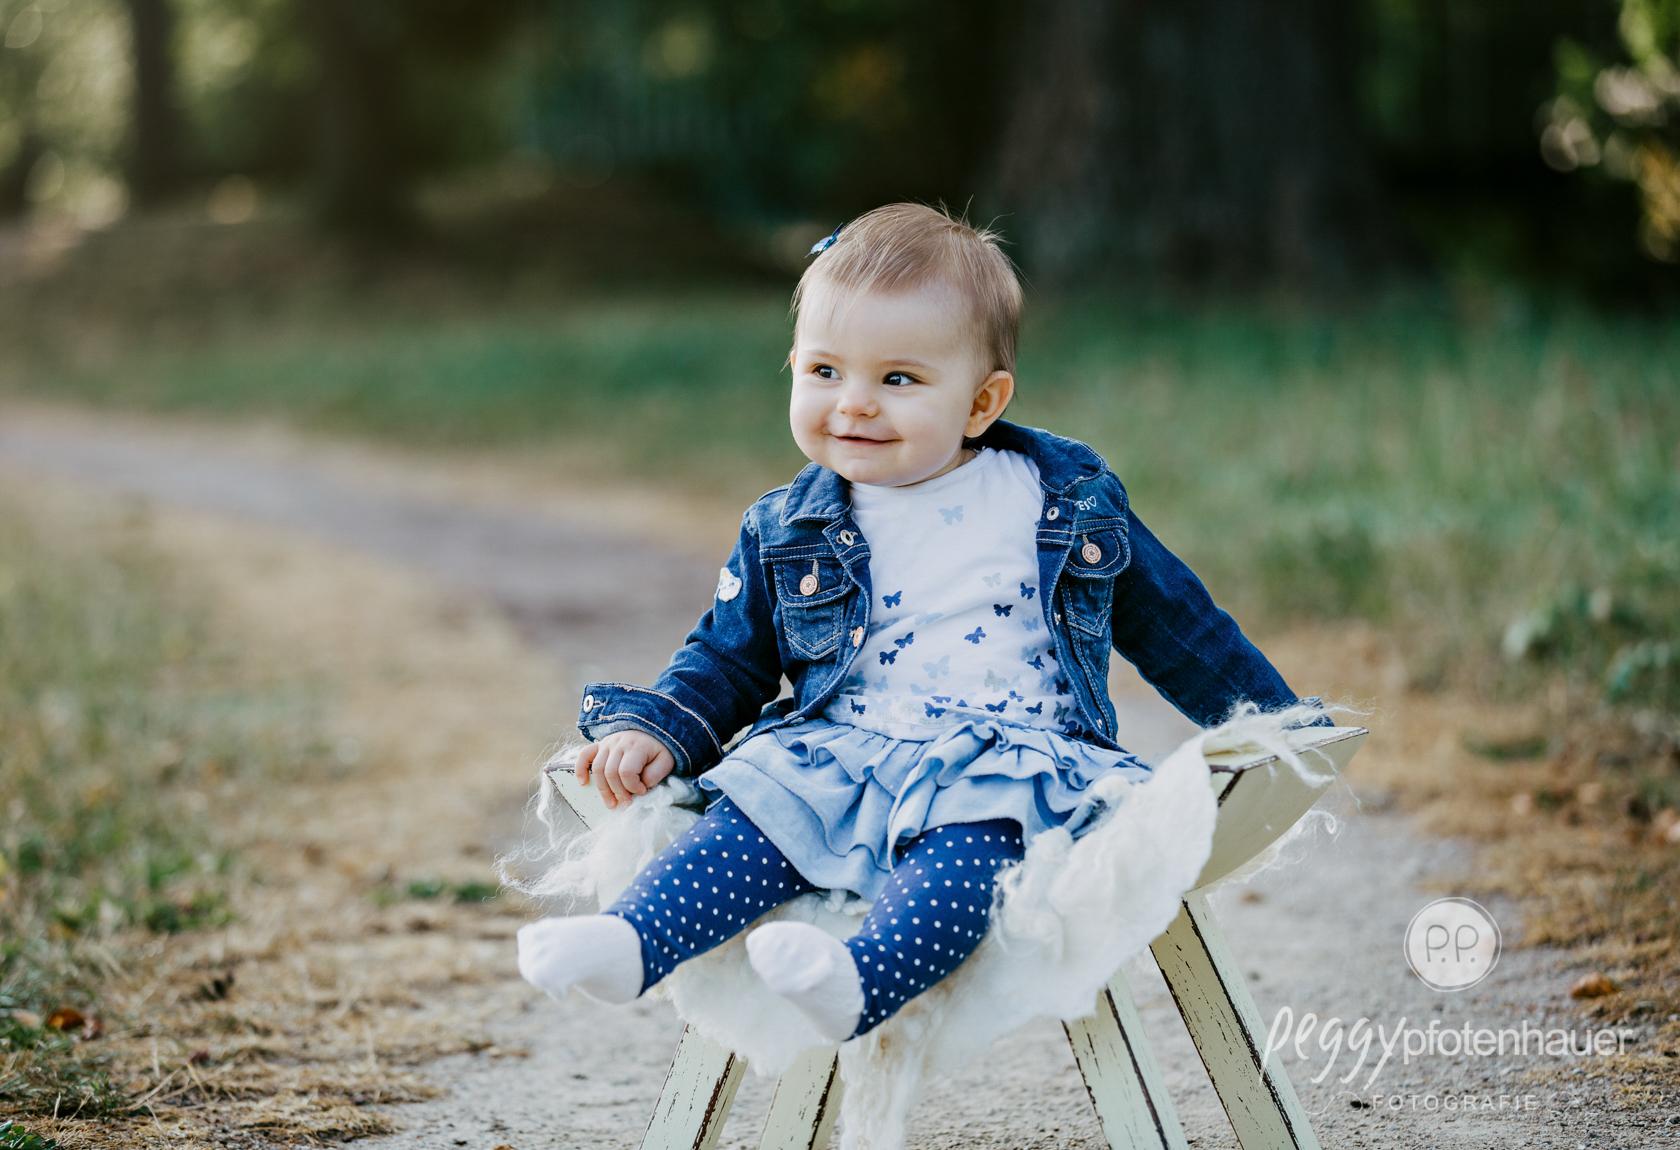 Kinder Peggy Pfotenhauer Fotografie